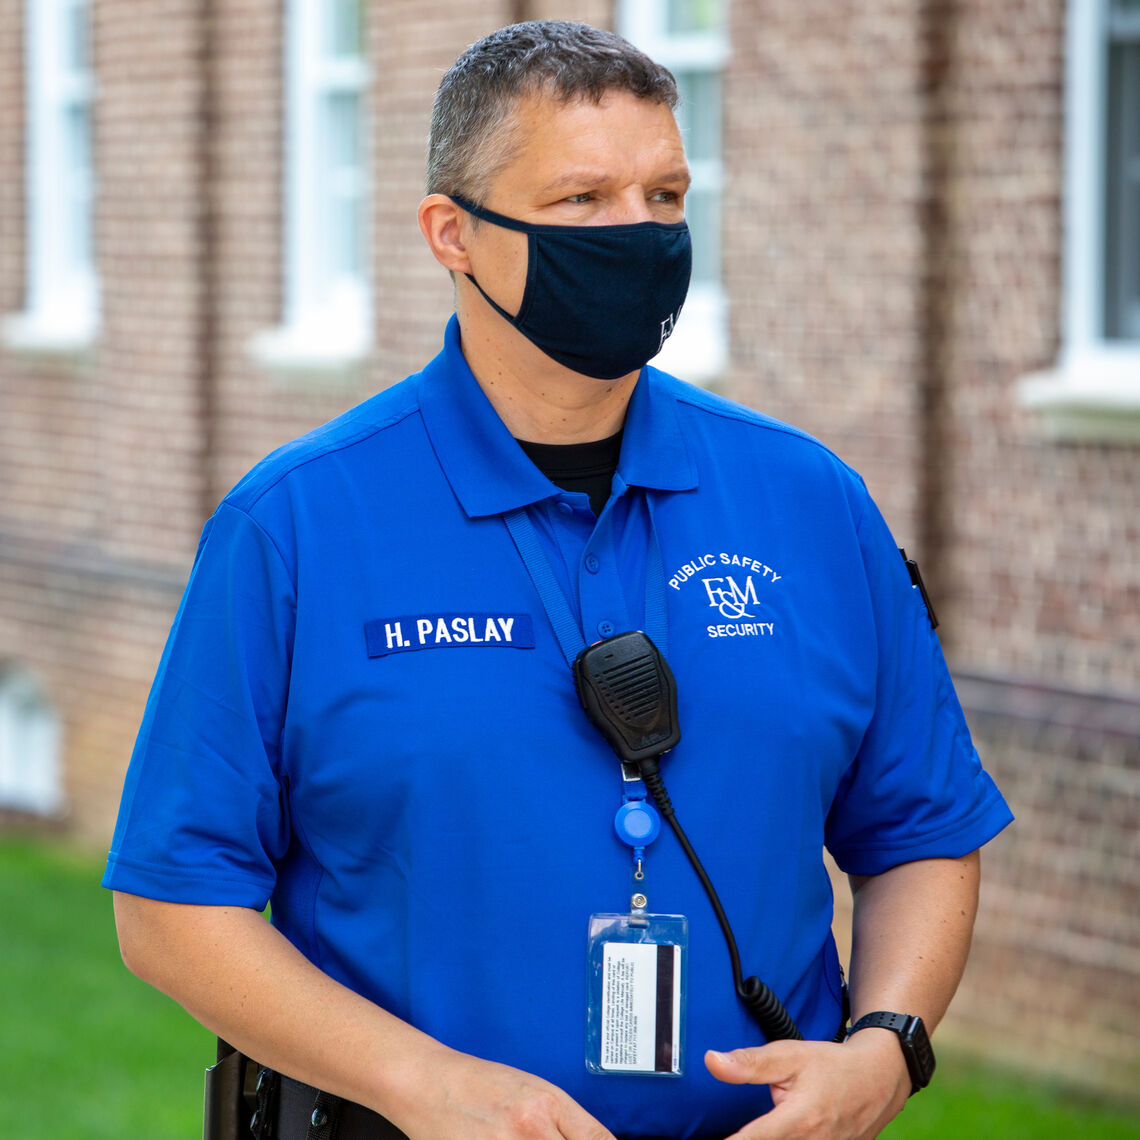 New Security Team uniform 9.3.2020